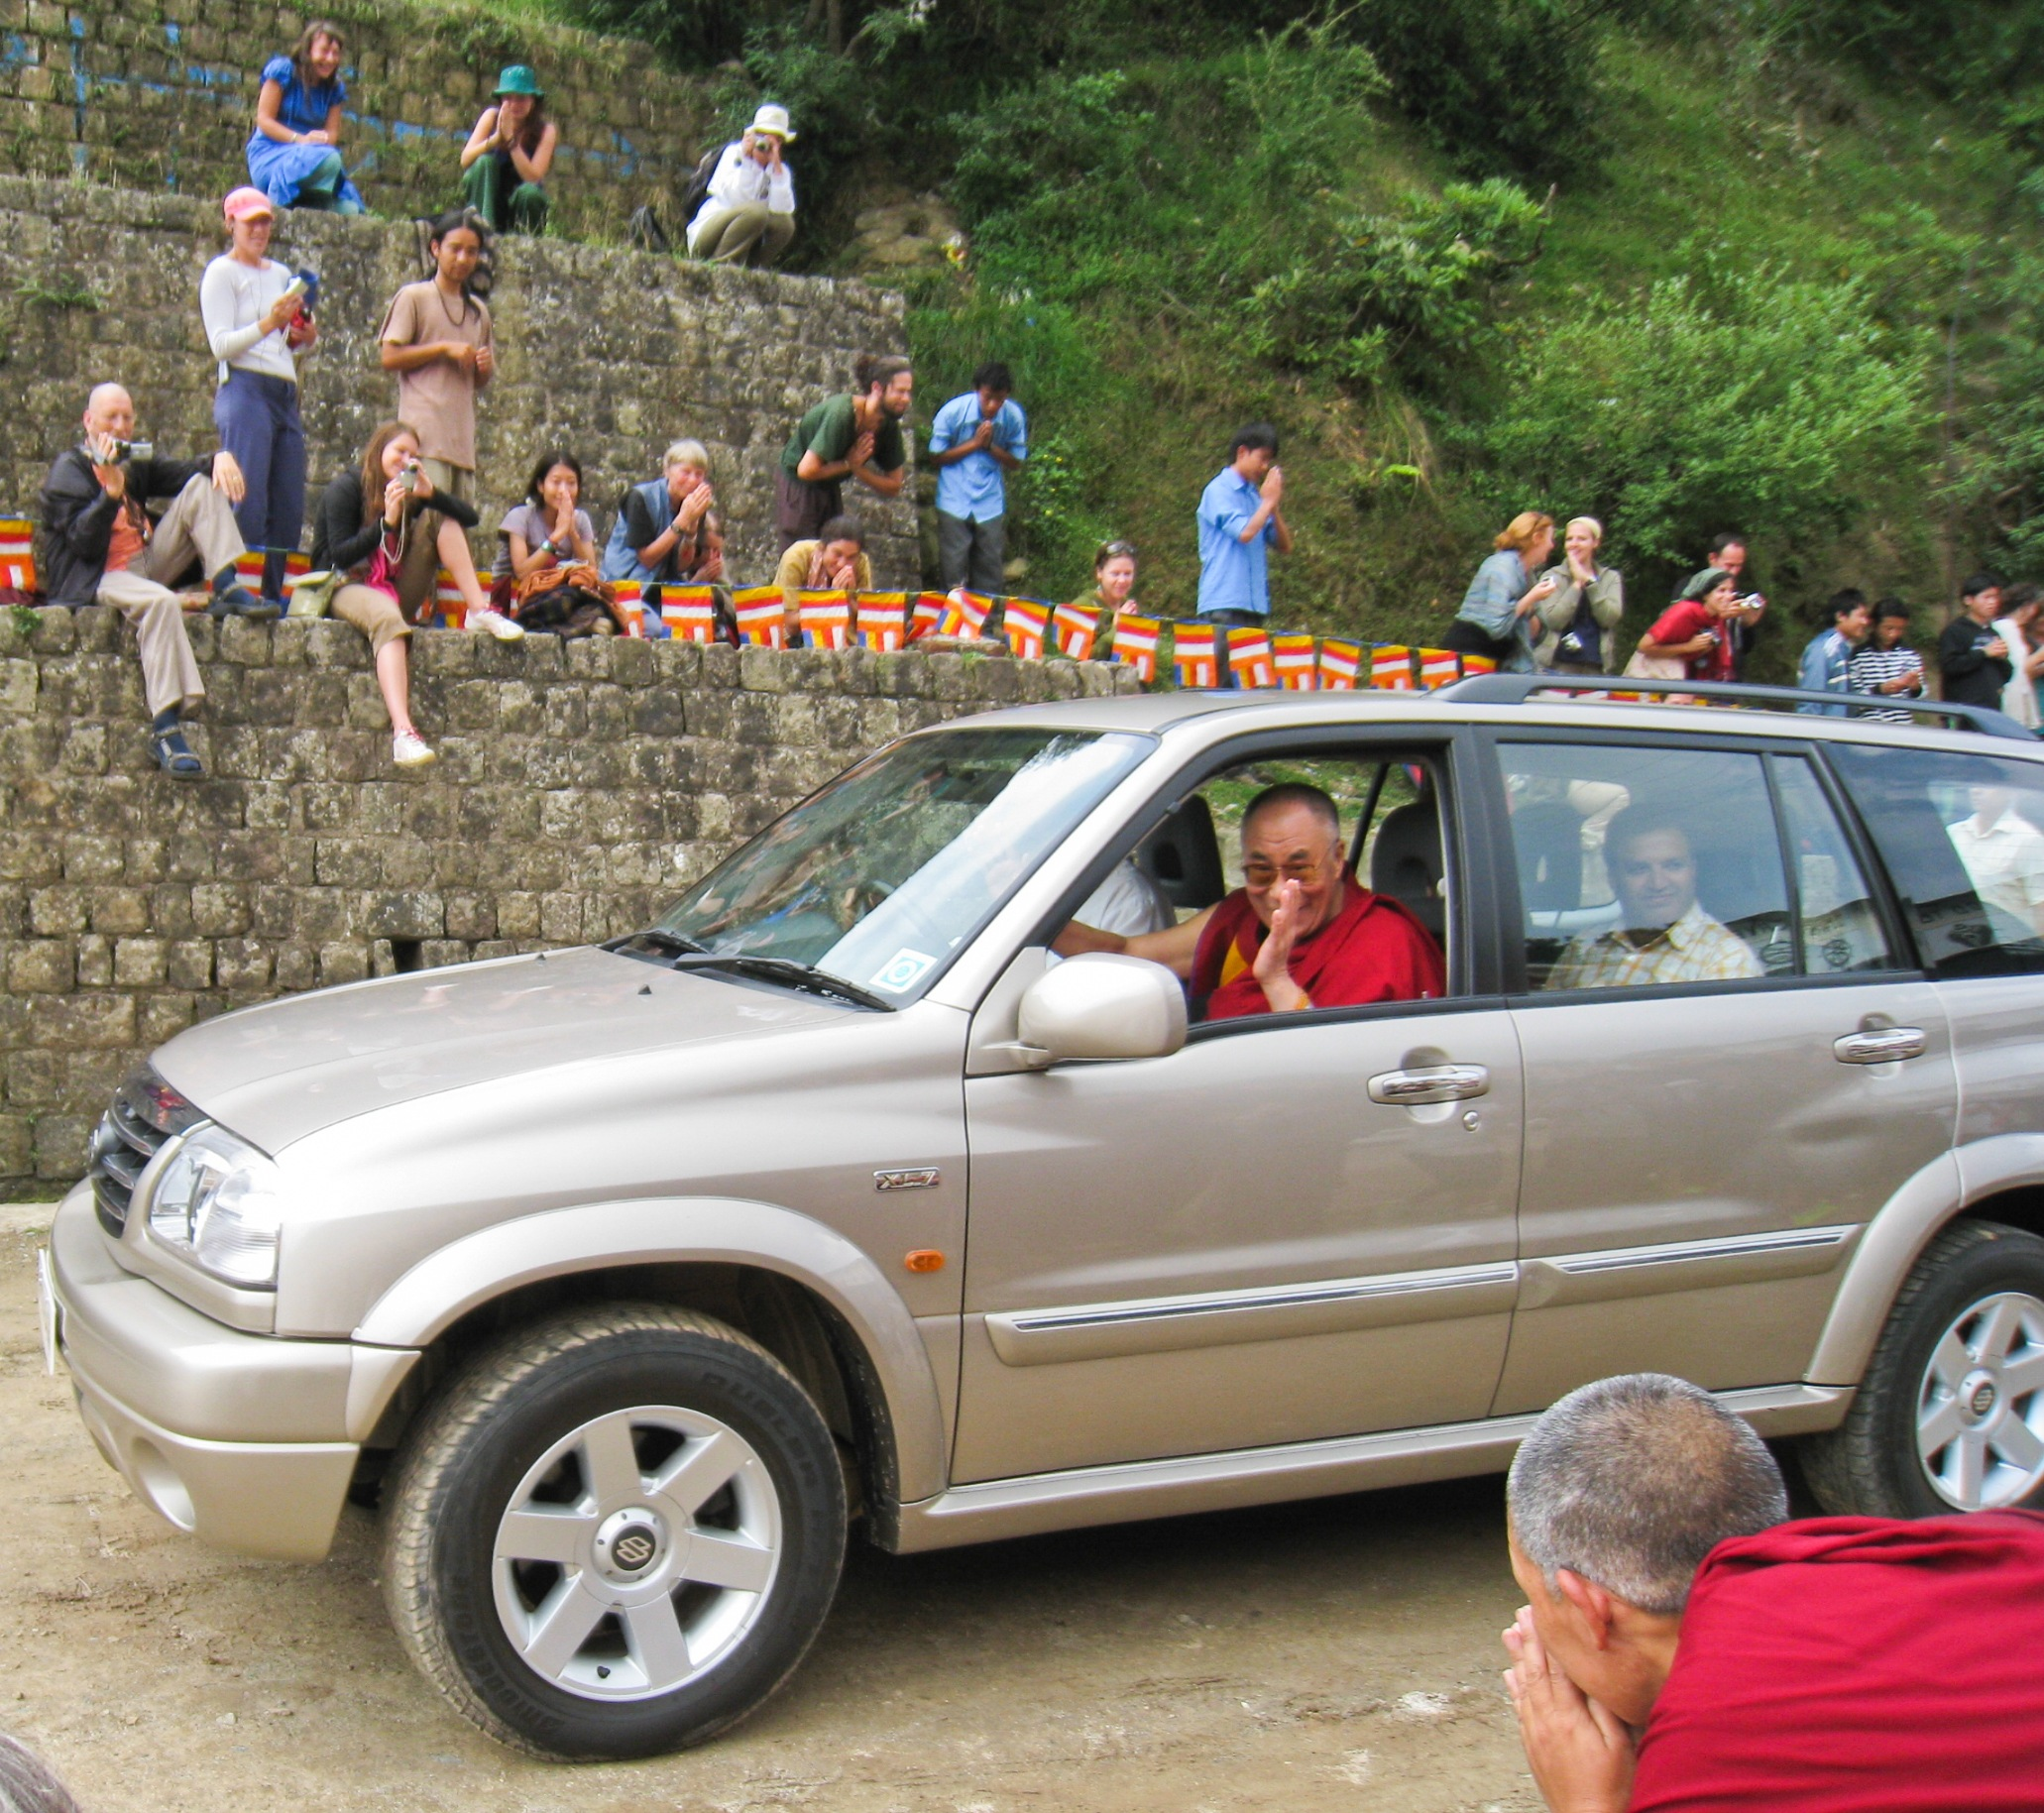 His Holiness the Dalai Lama in northern India.